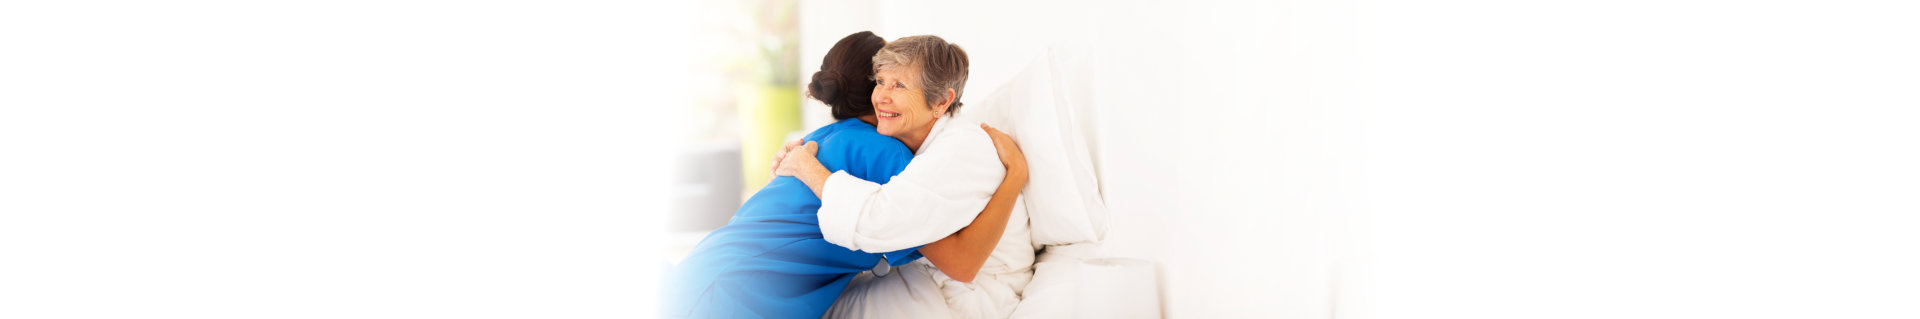 happy elderly woman hugging caregiver on bed